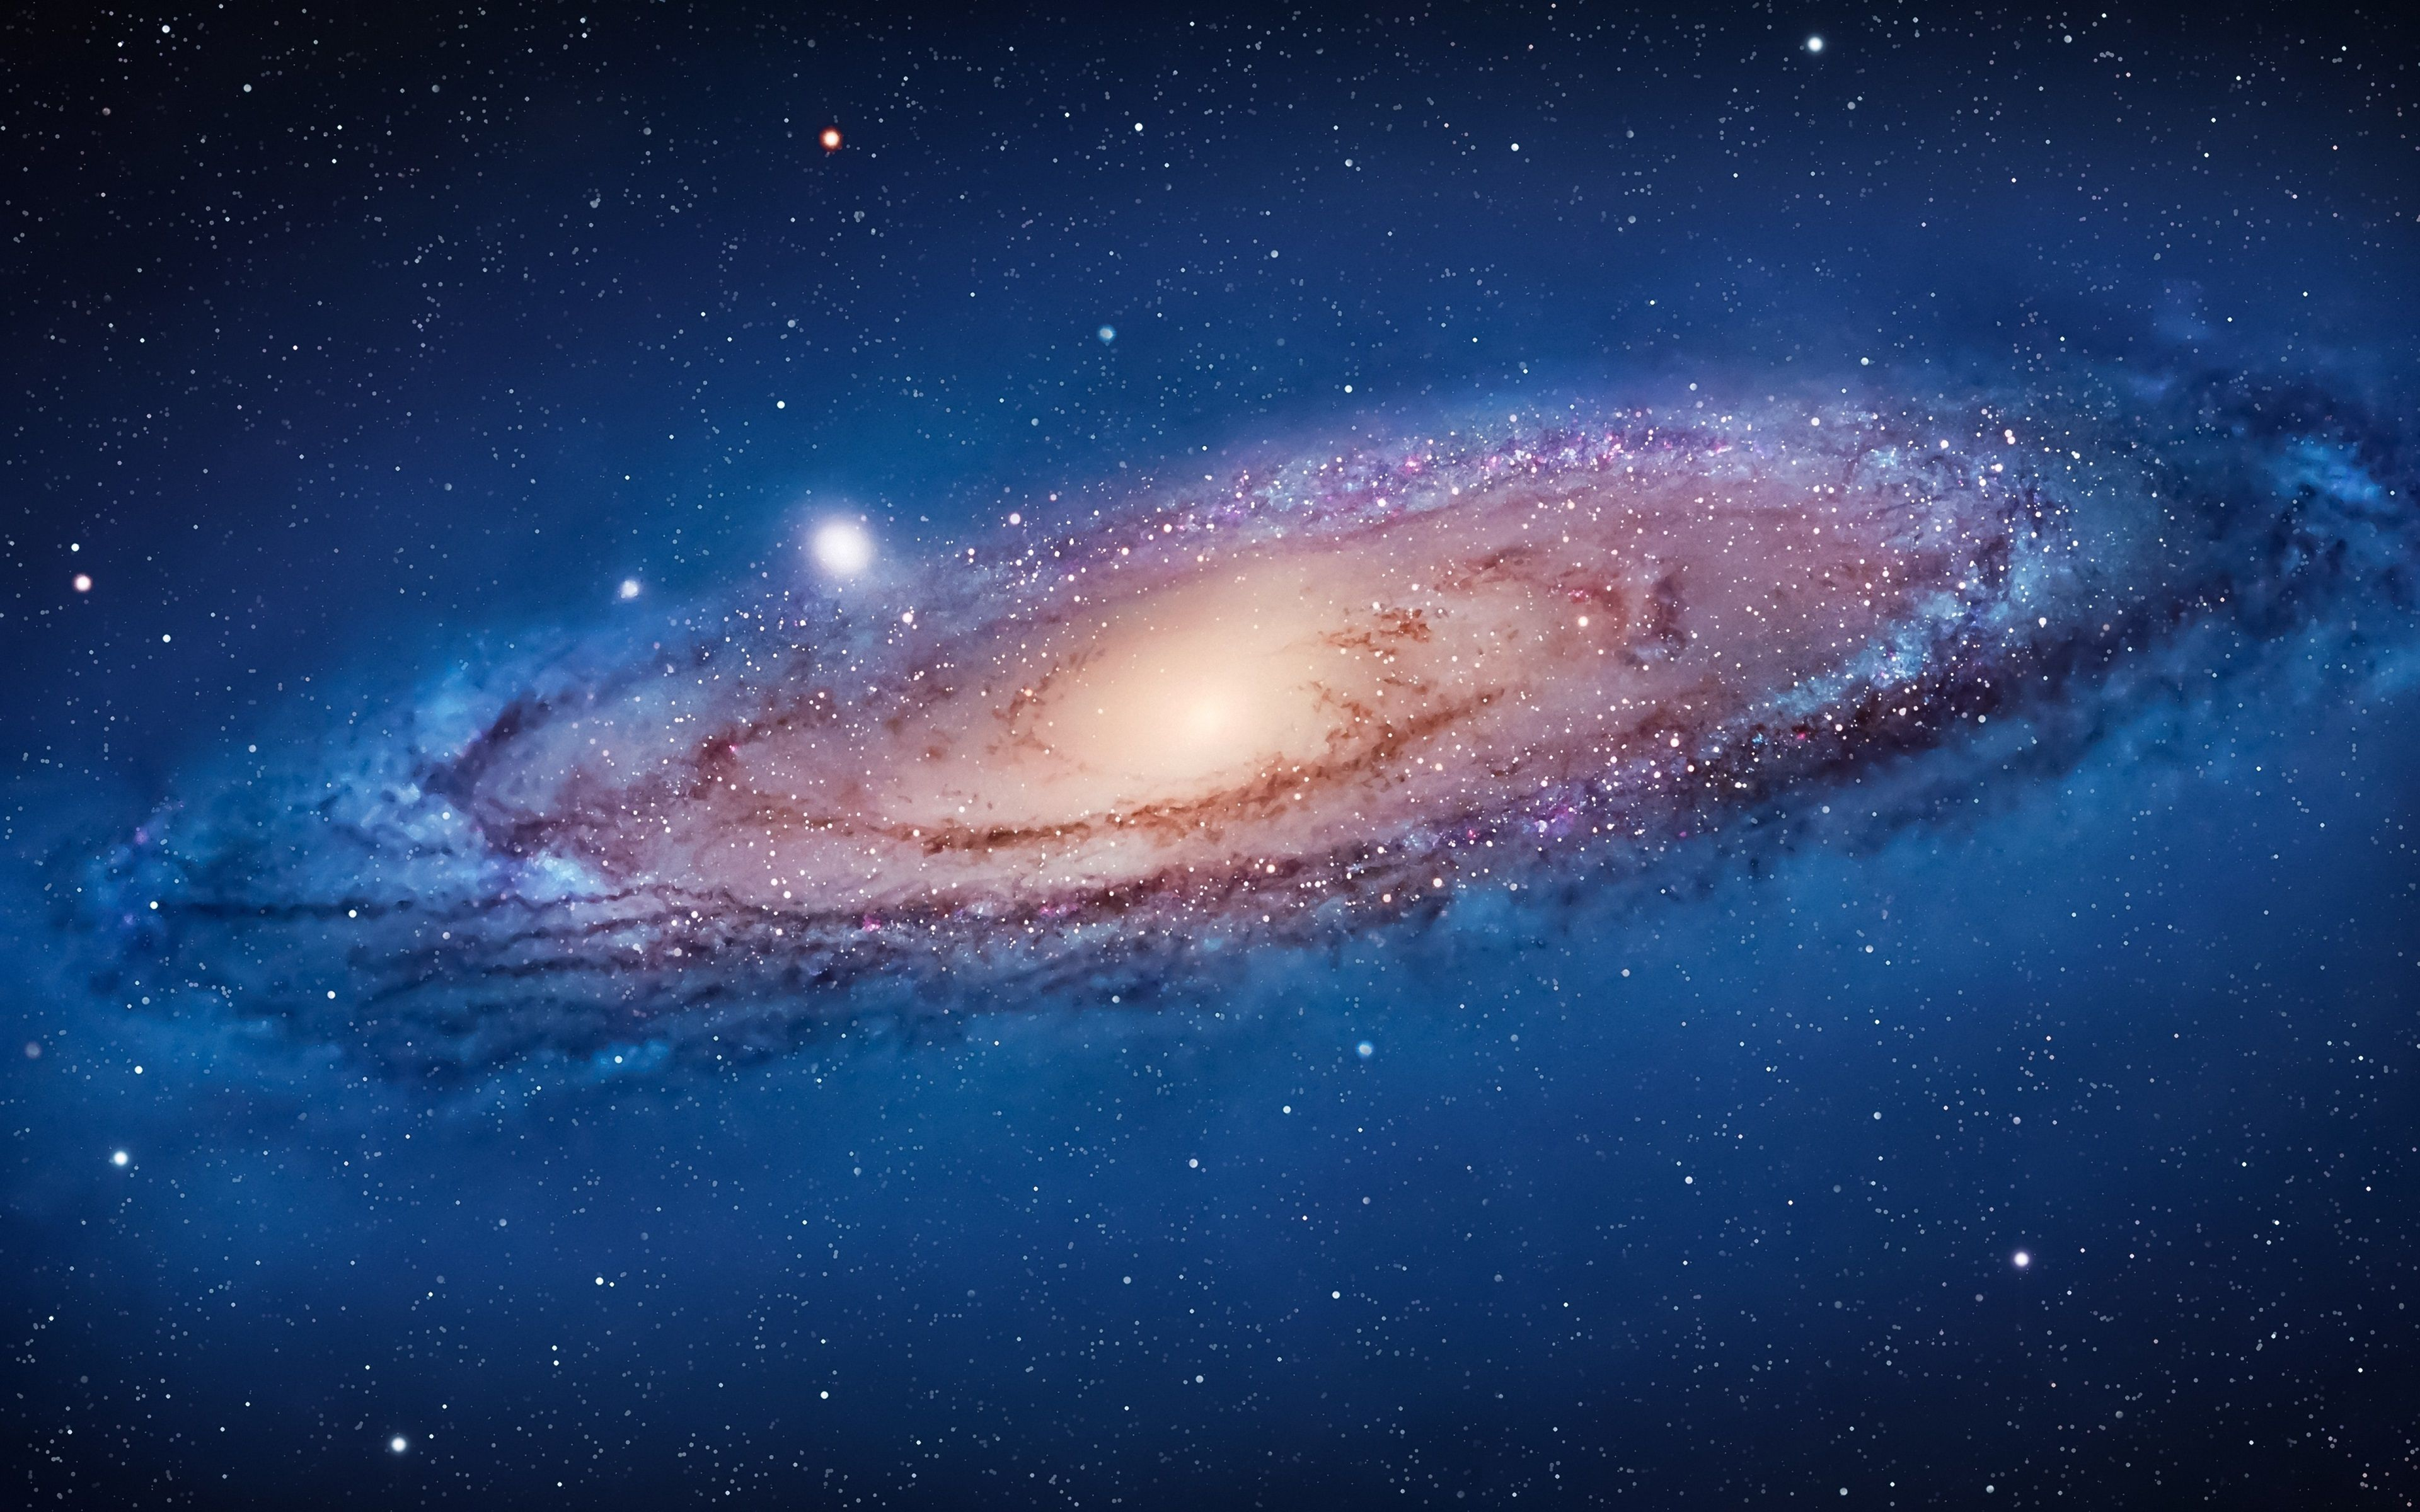 3840x2400 Galaxy 4k Wallpaper Hd Free Download Galaxy Wallpaper Galaxy Hd Andromeda Galaxy